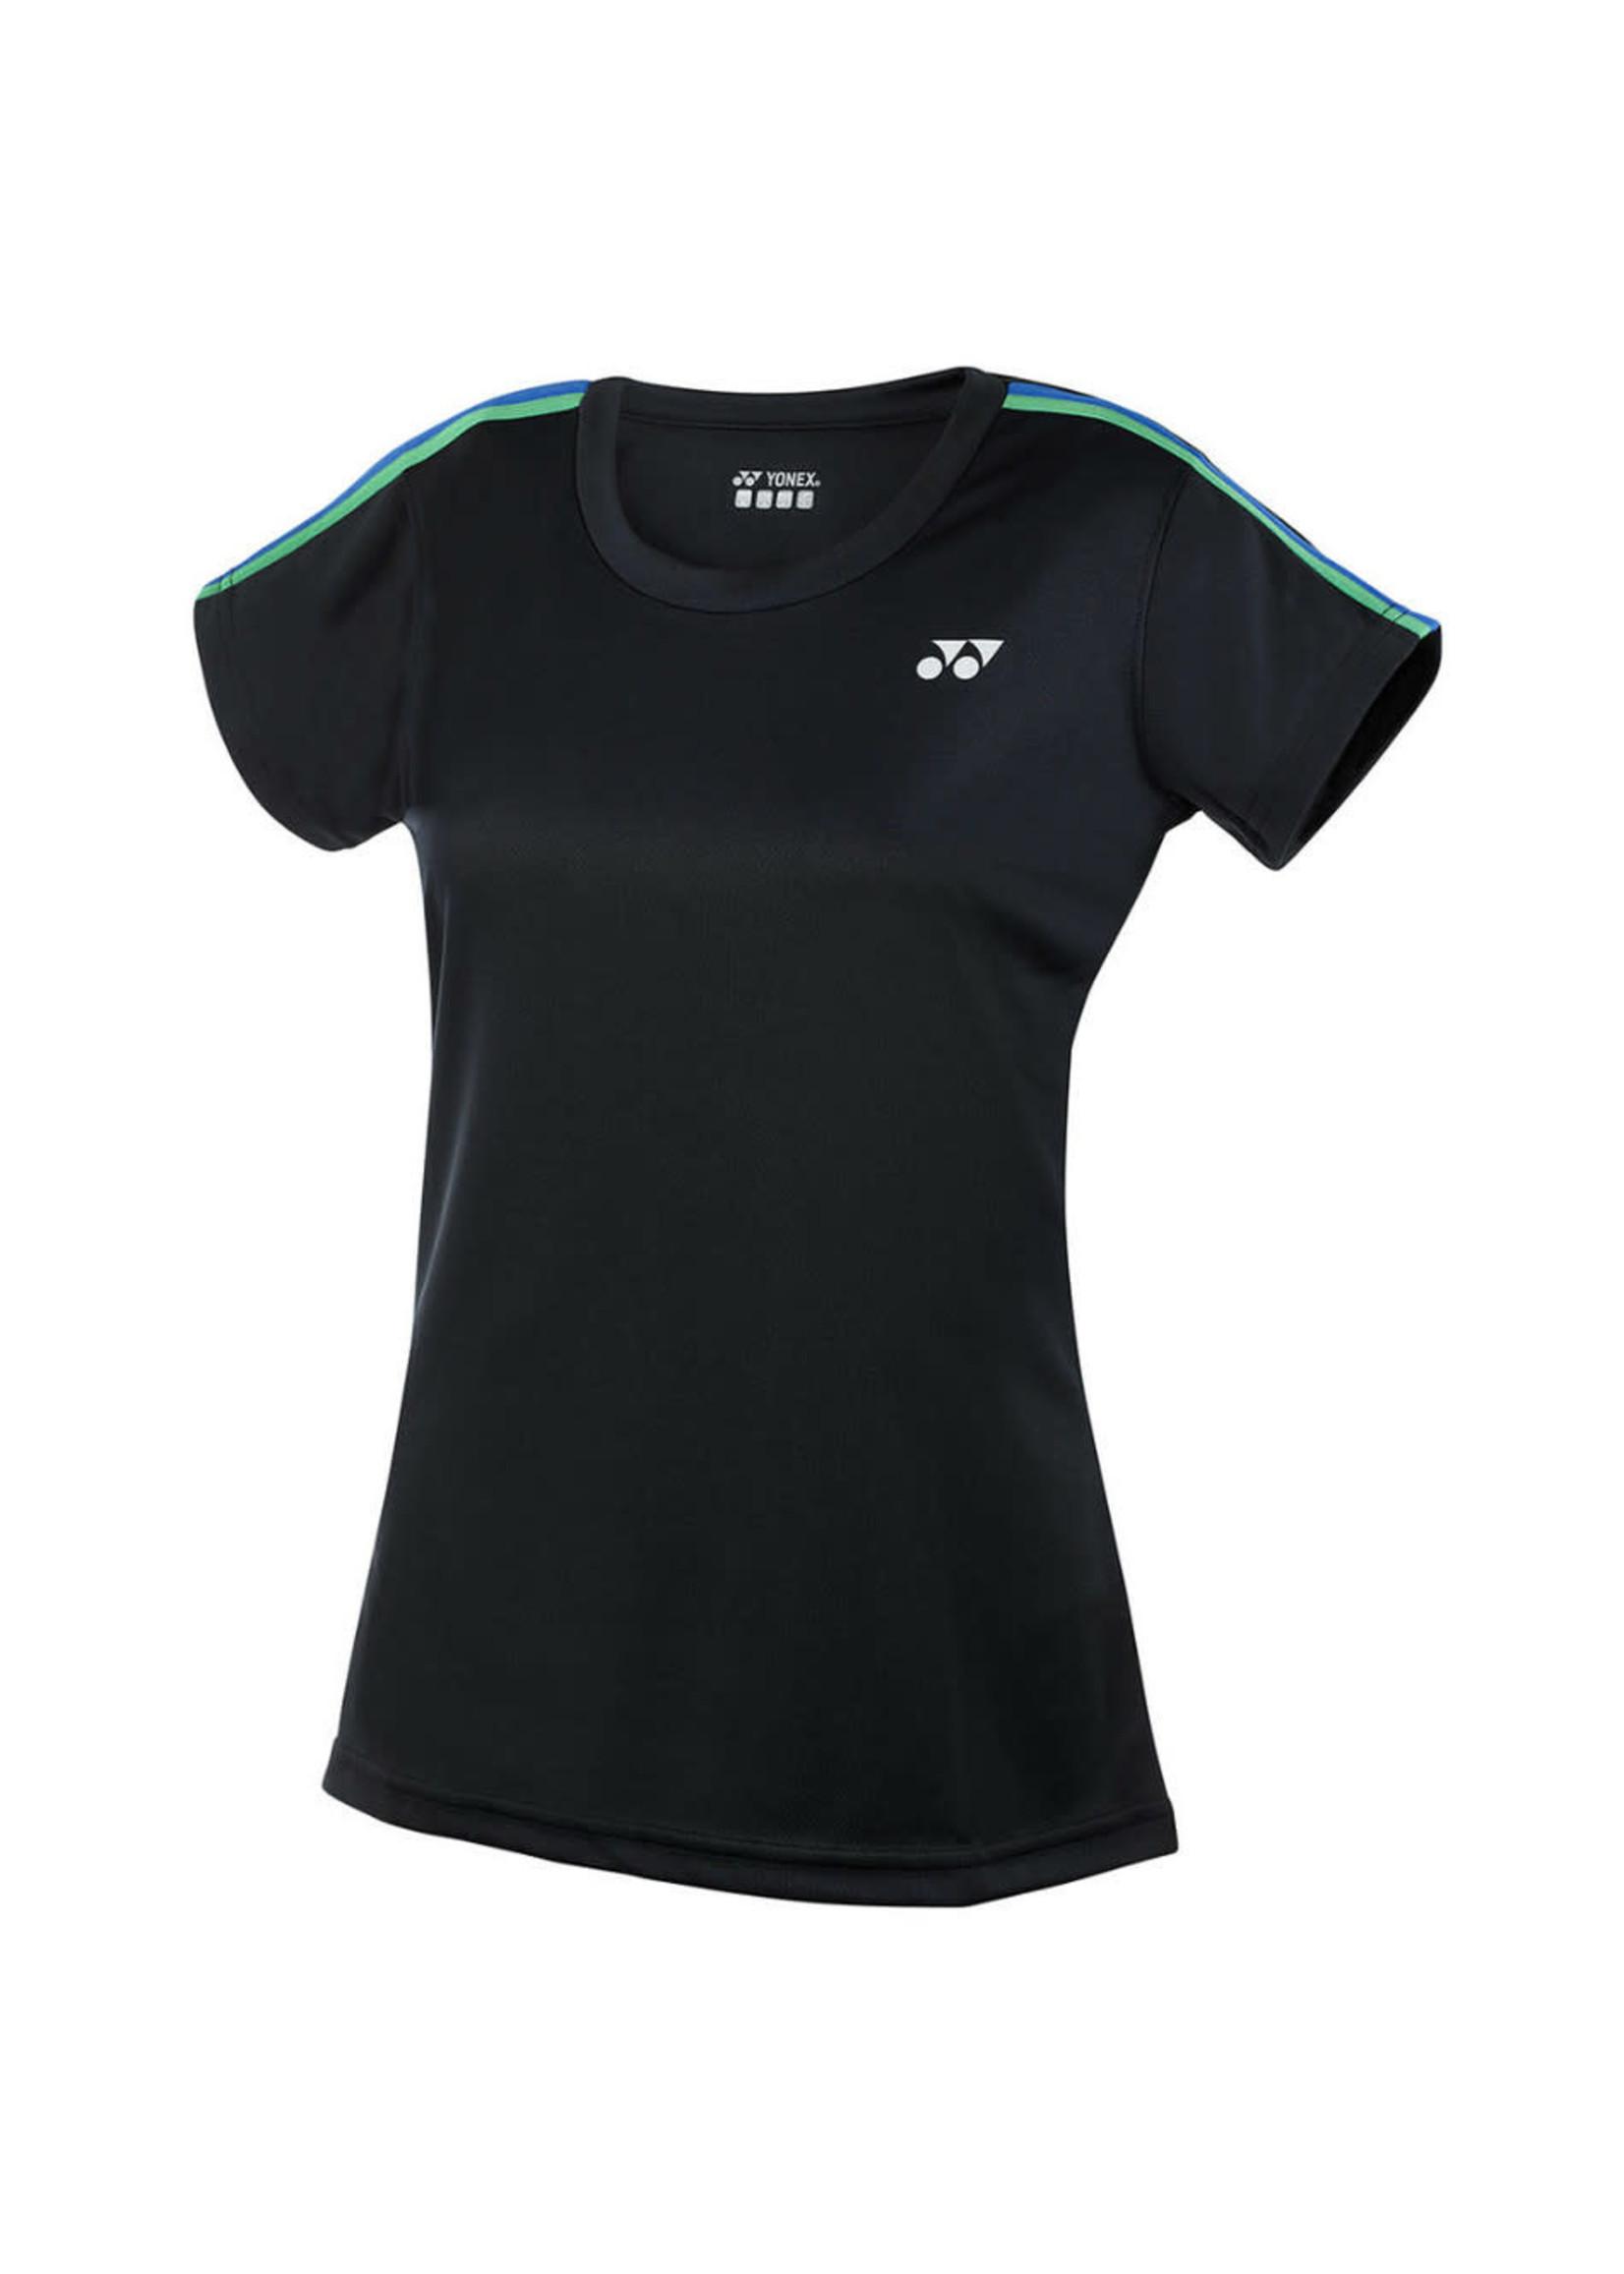 Yonex Yonex Ladies YT1005EX T-shirt (2018)